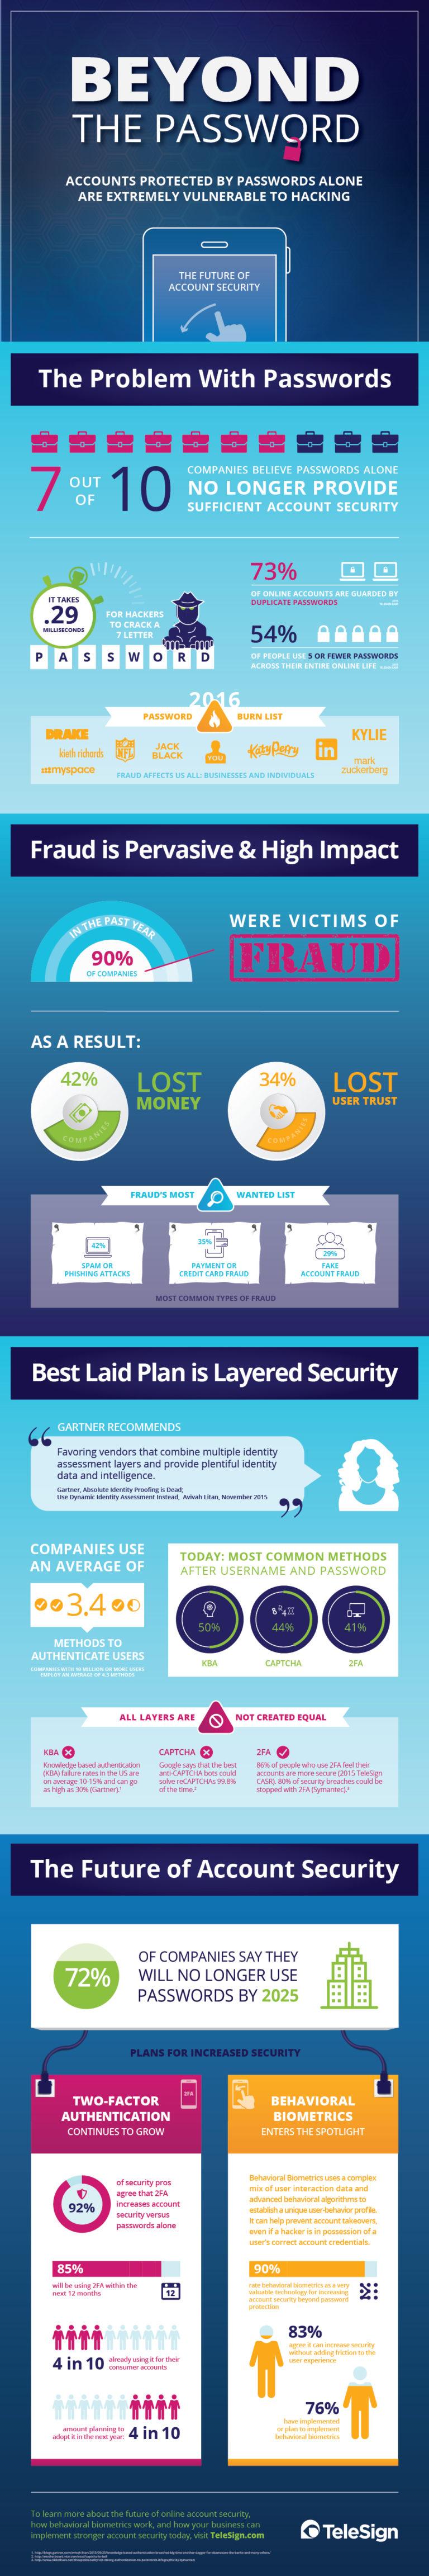 TeleSign-Future-of-Account-Security-Report-infographic-768x4608